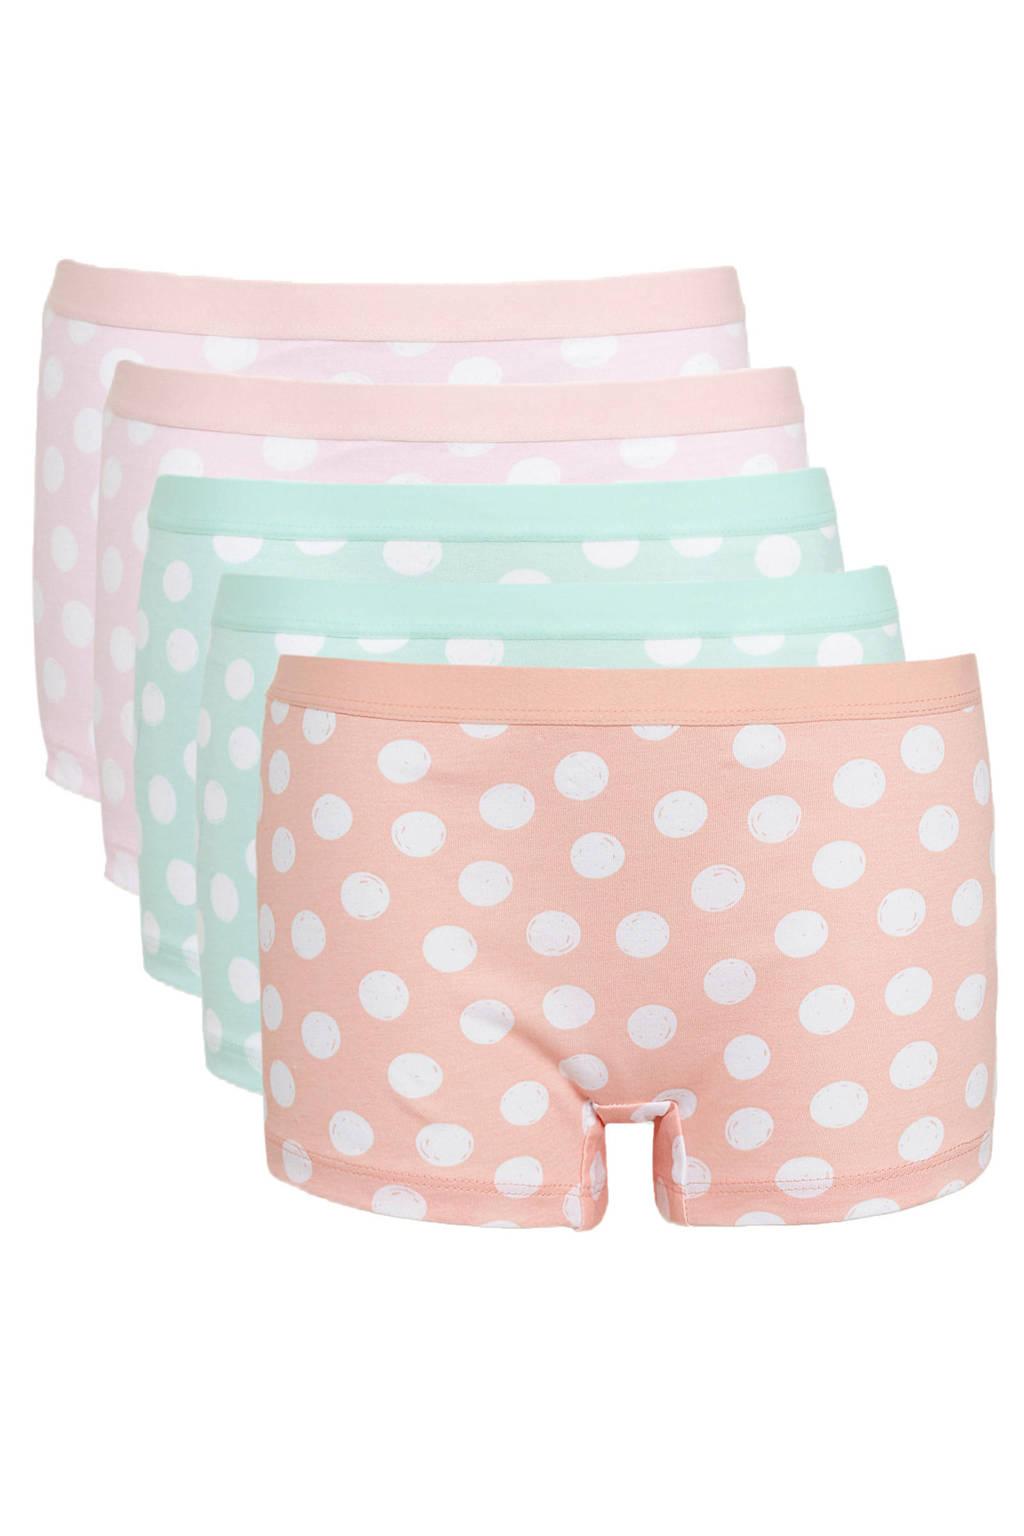 C&A Here & There short - set van 5 roze/groen/oranje, Roze/groen/oranje